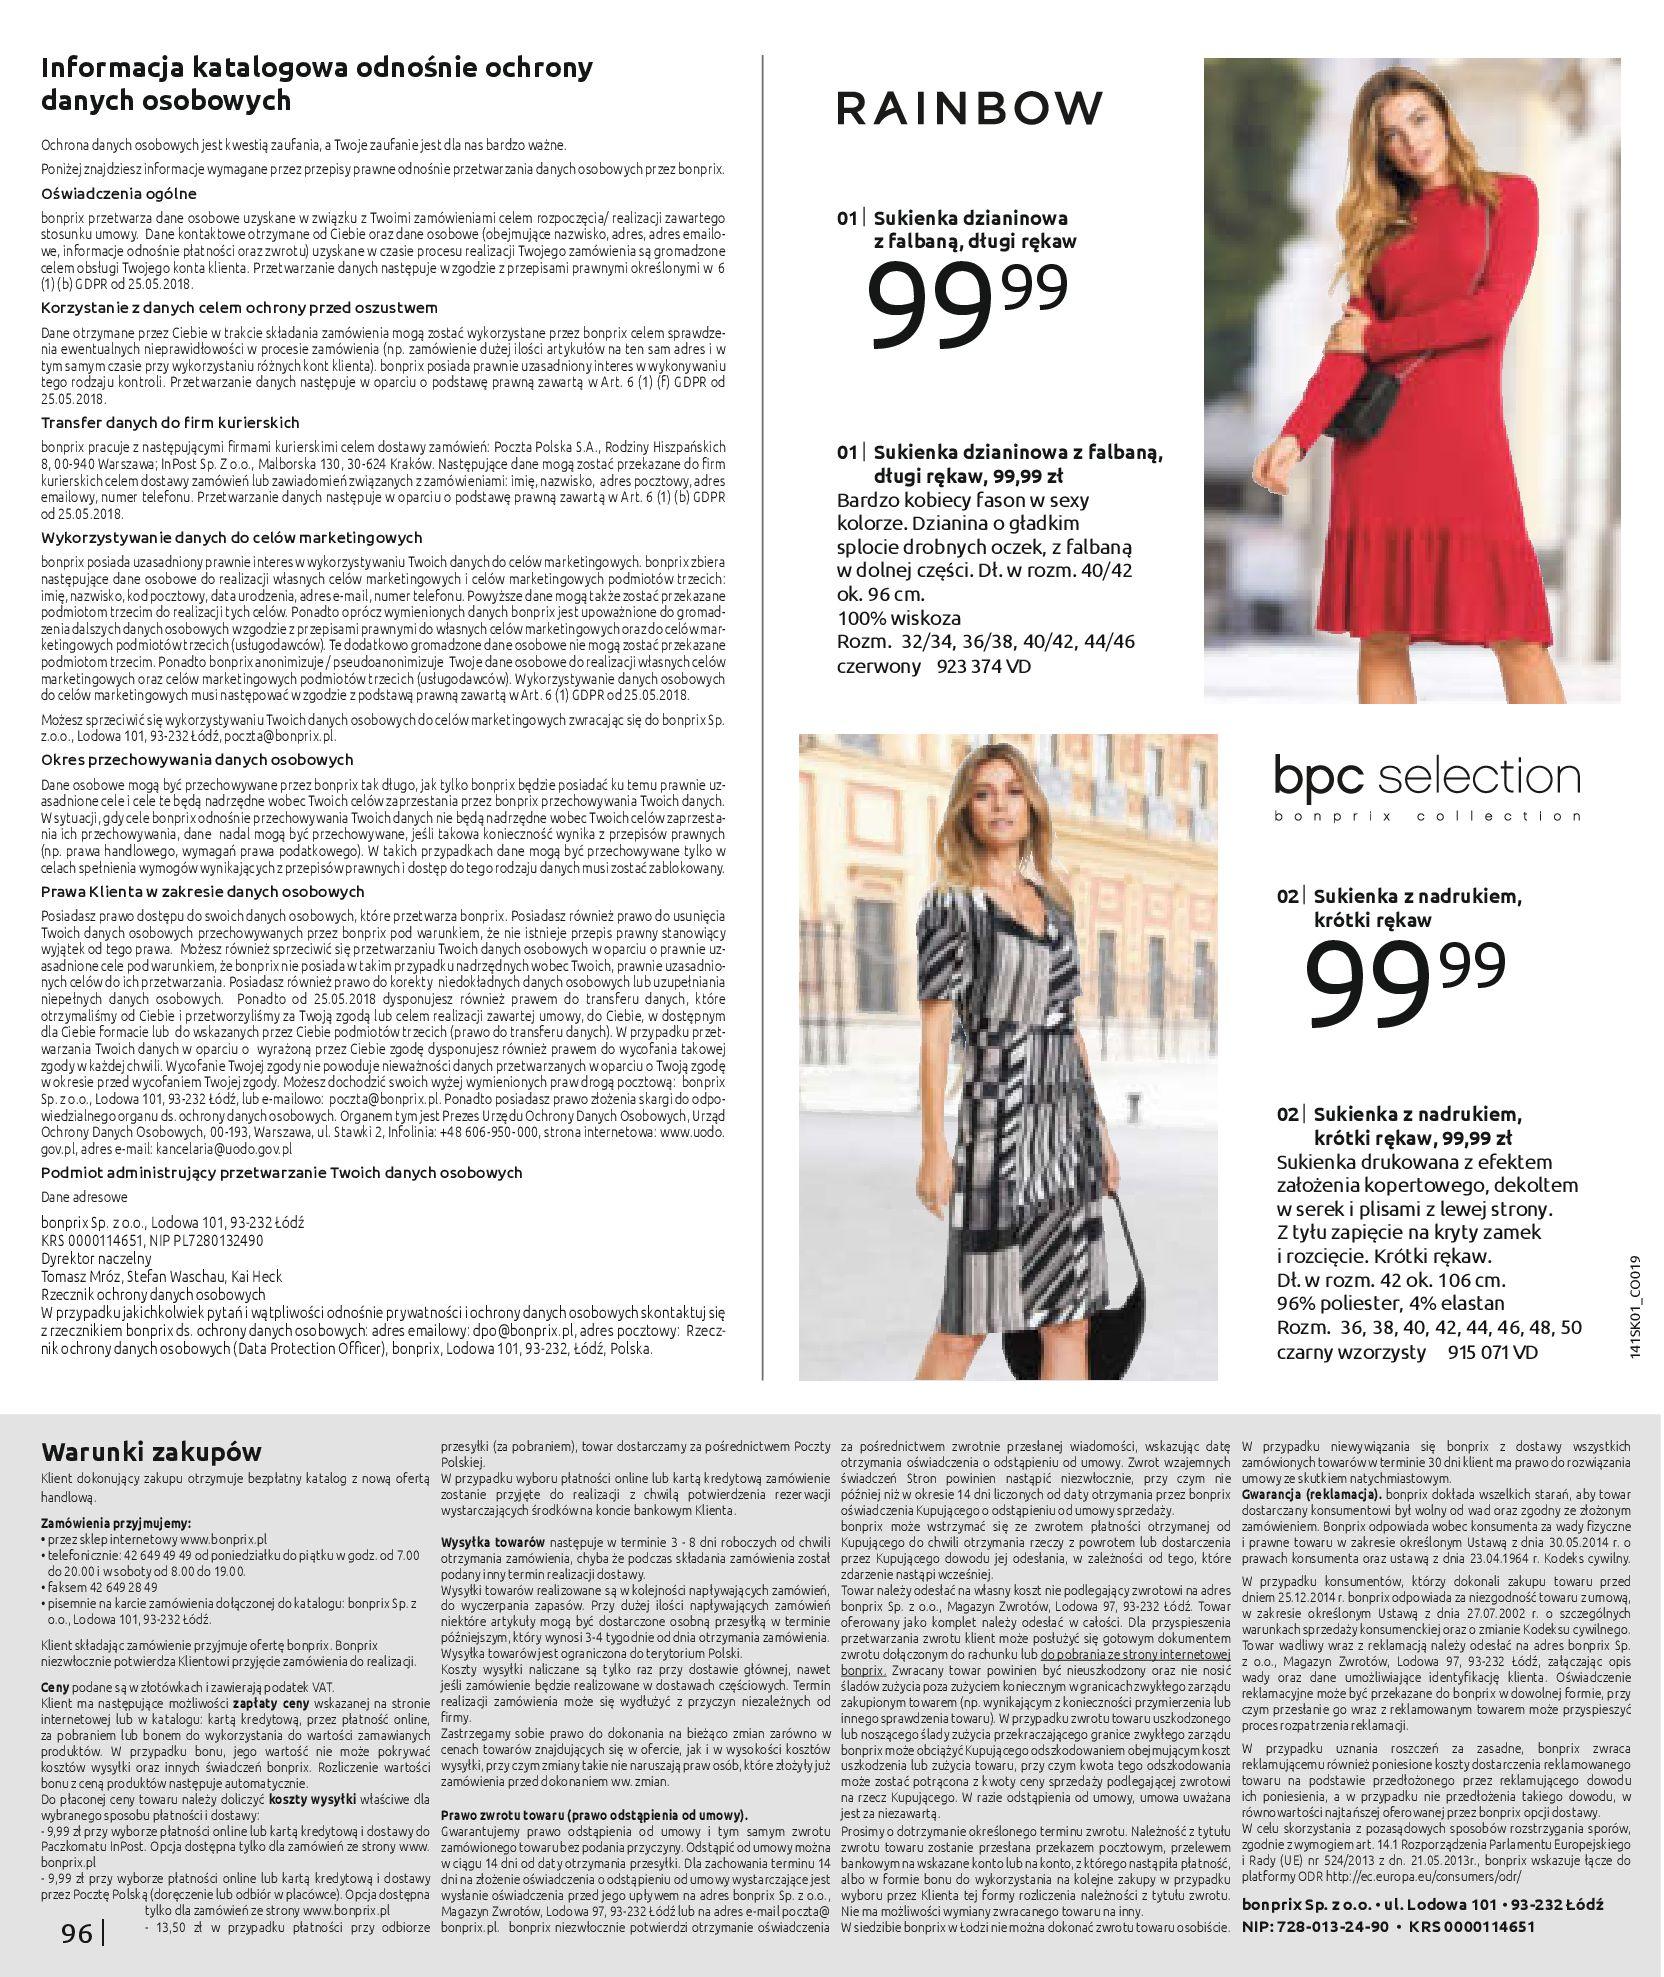 Gazetka Bonprix - Oferta handlowa-20.01.2020-31.03.2020-page-98